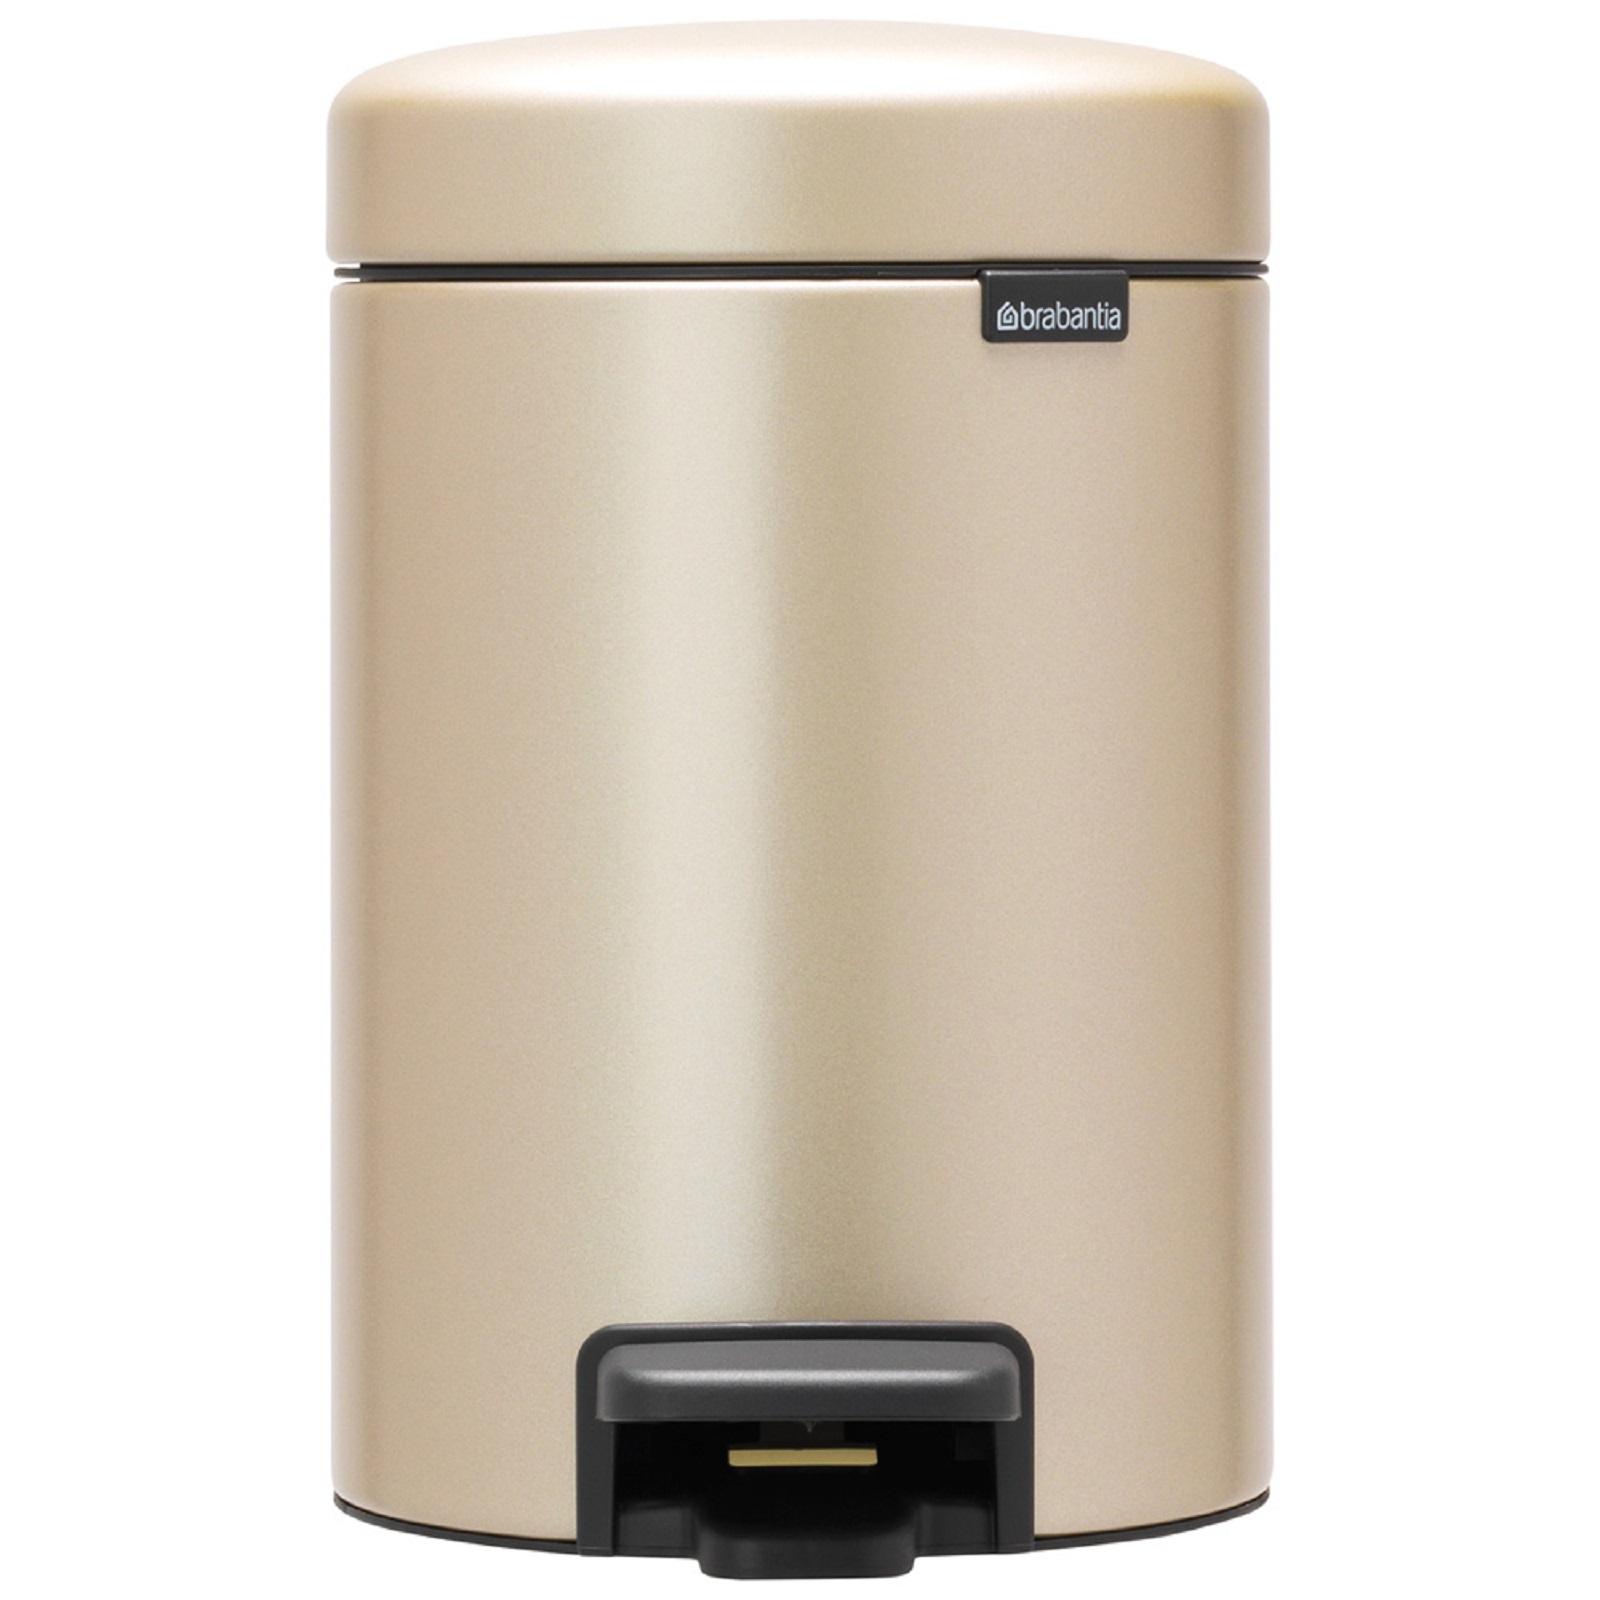 Онлайн каталог PROMENU: Бак для мусора Pedal Bin NewIcon Brabantia, объем 3 л, шампань бежевый  304408